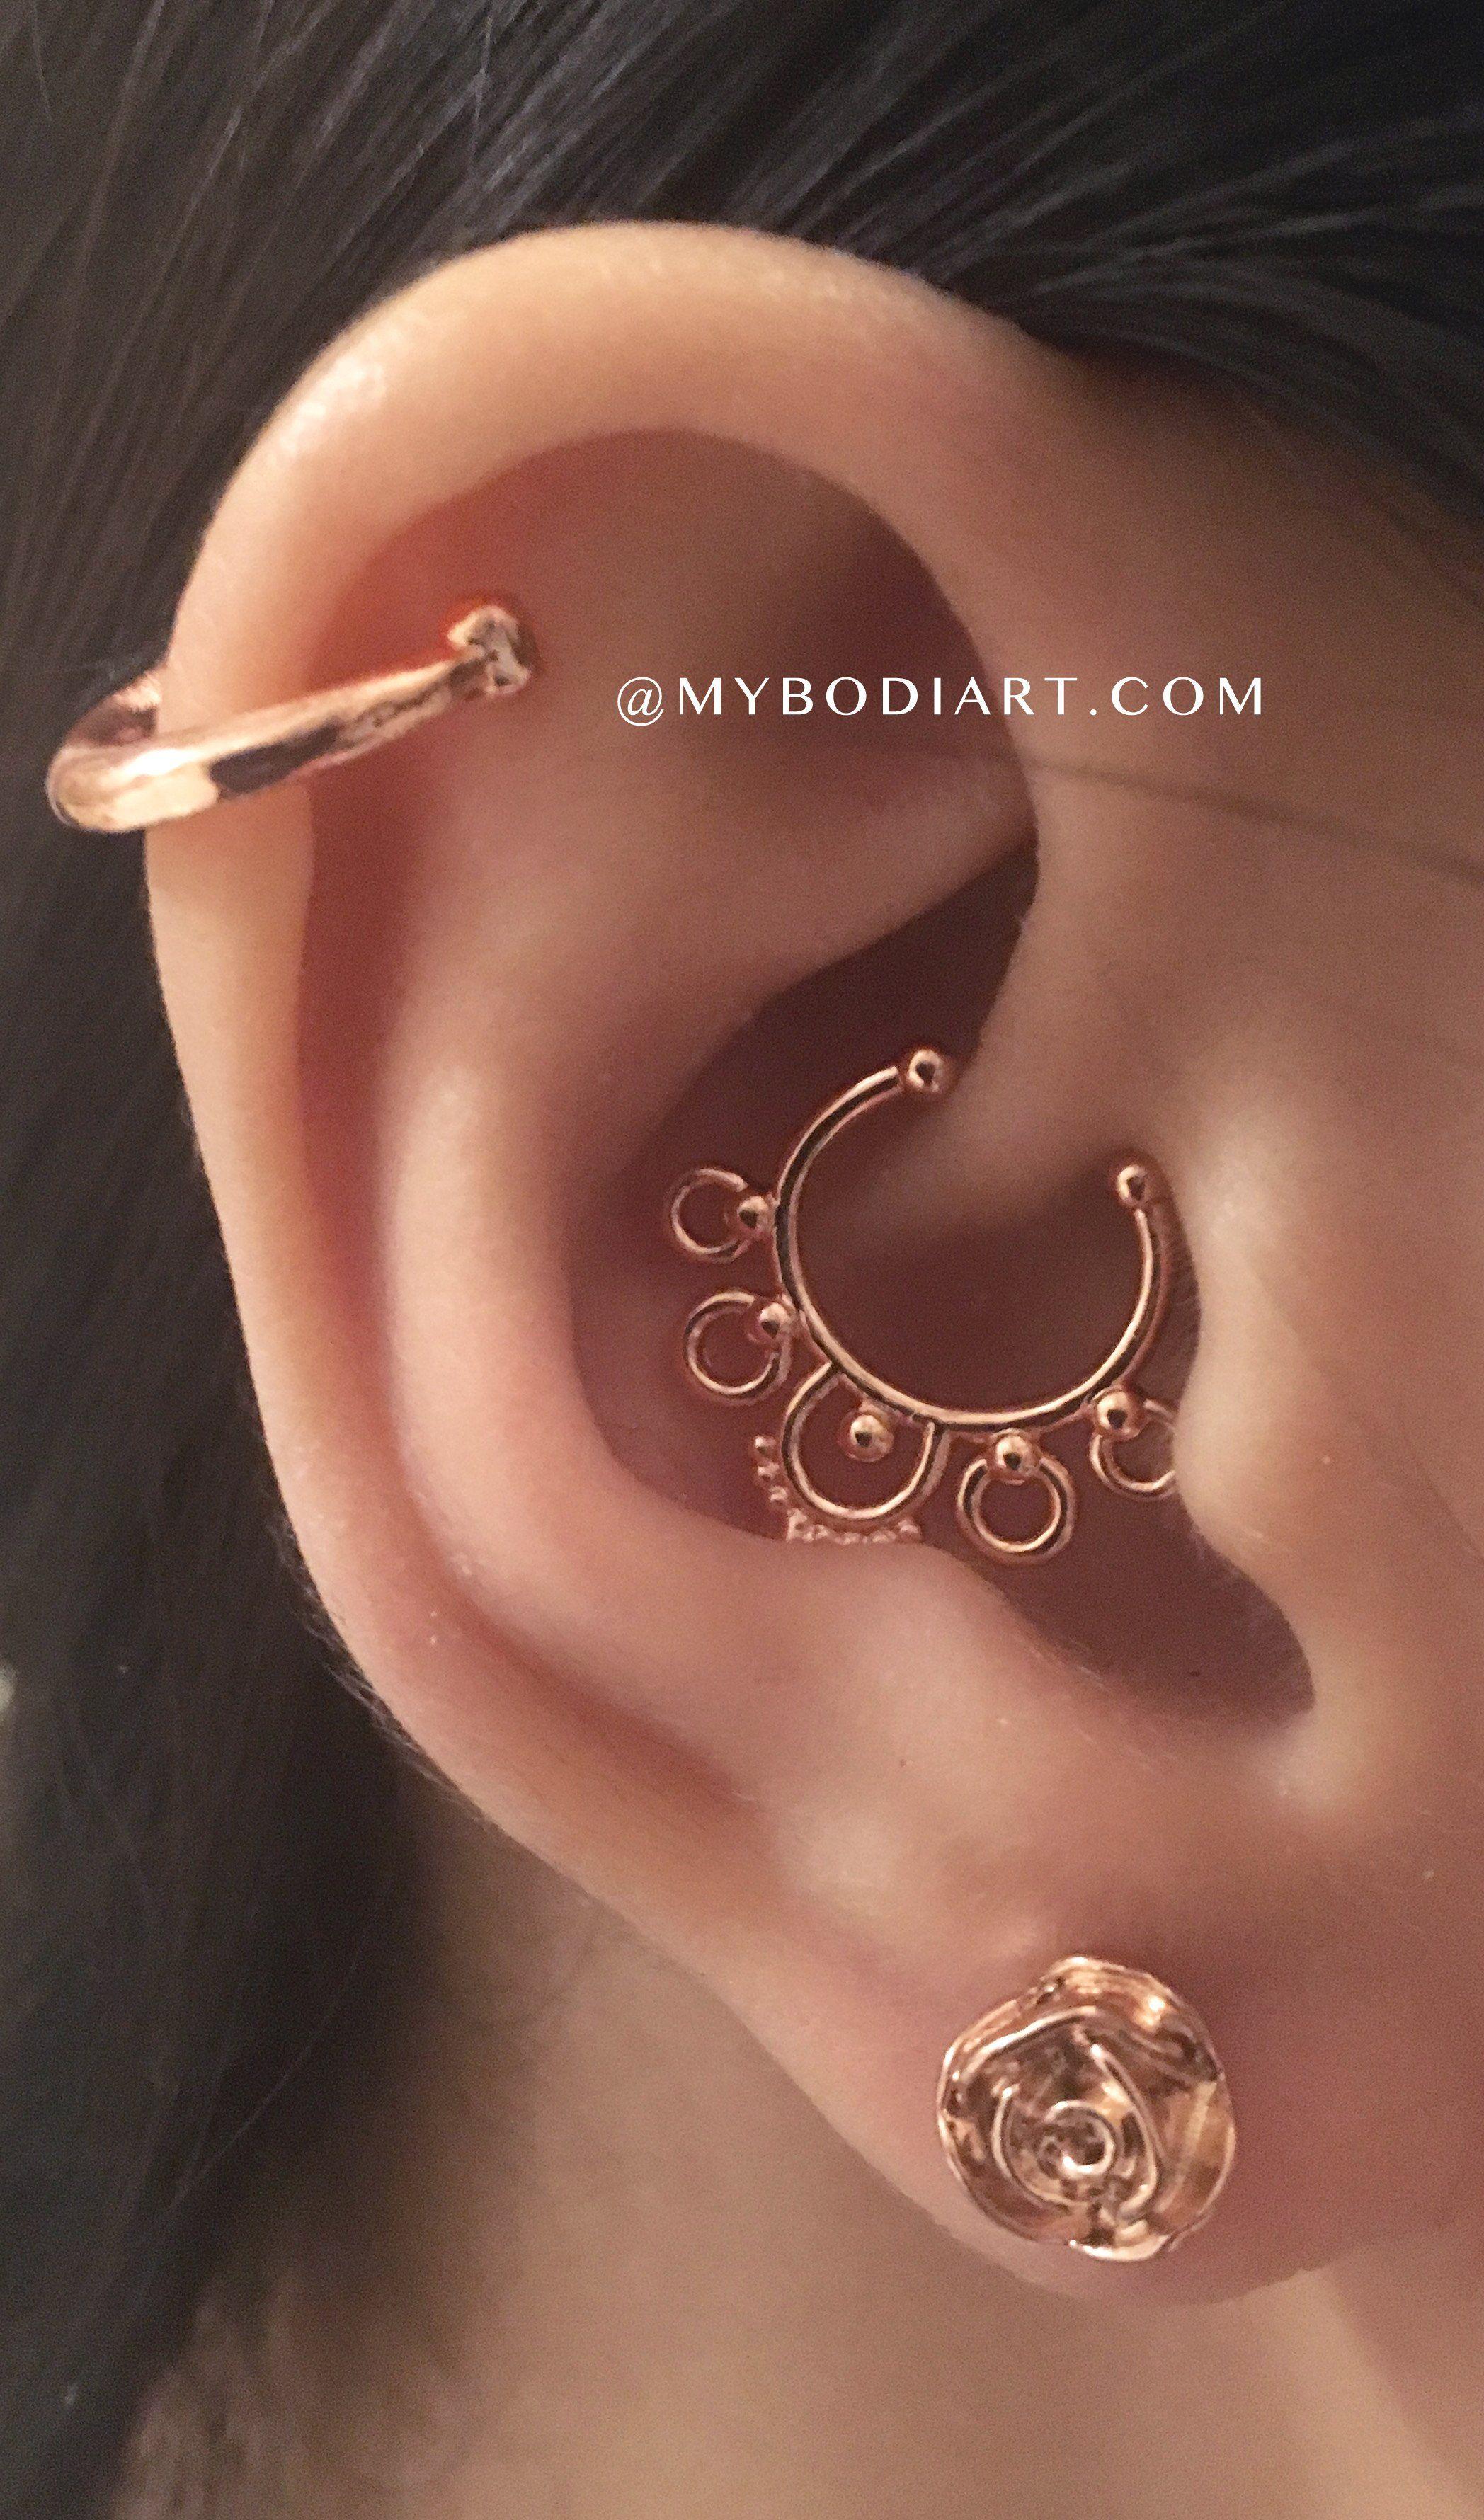 Nose piercing ring vs stud  Hannah Rose G Barbell Ear Piercing Earring  Piercings Size